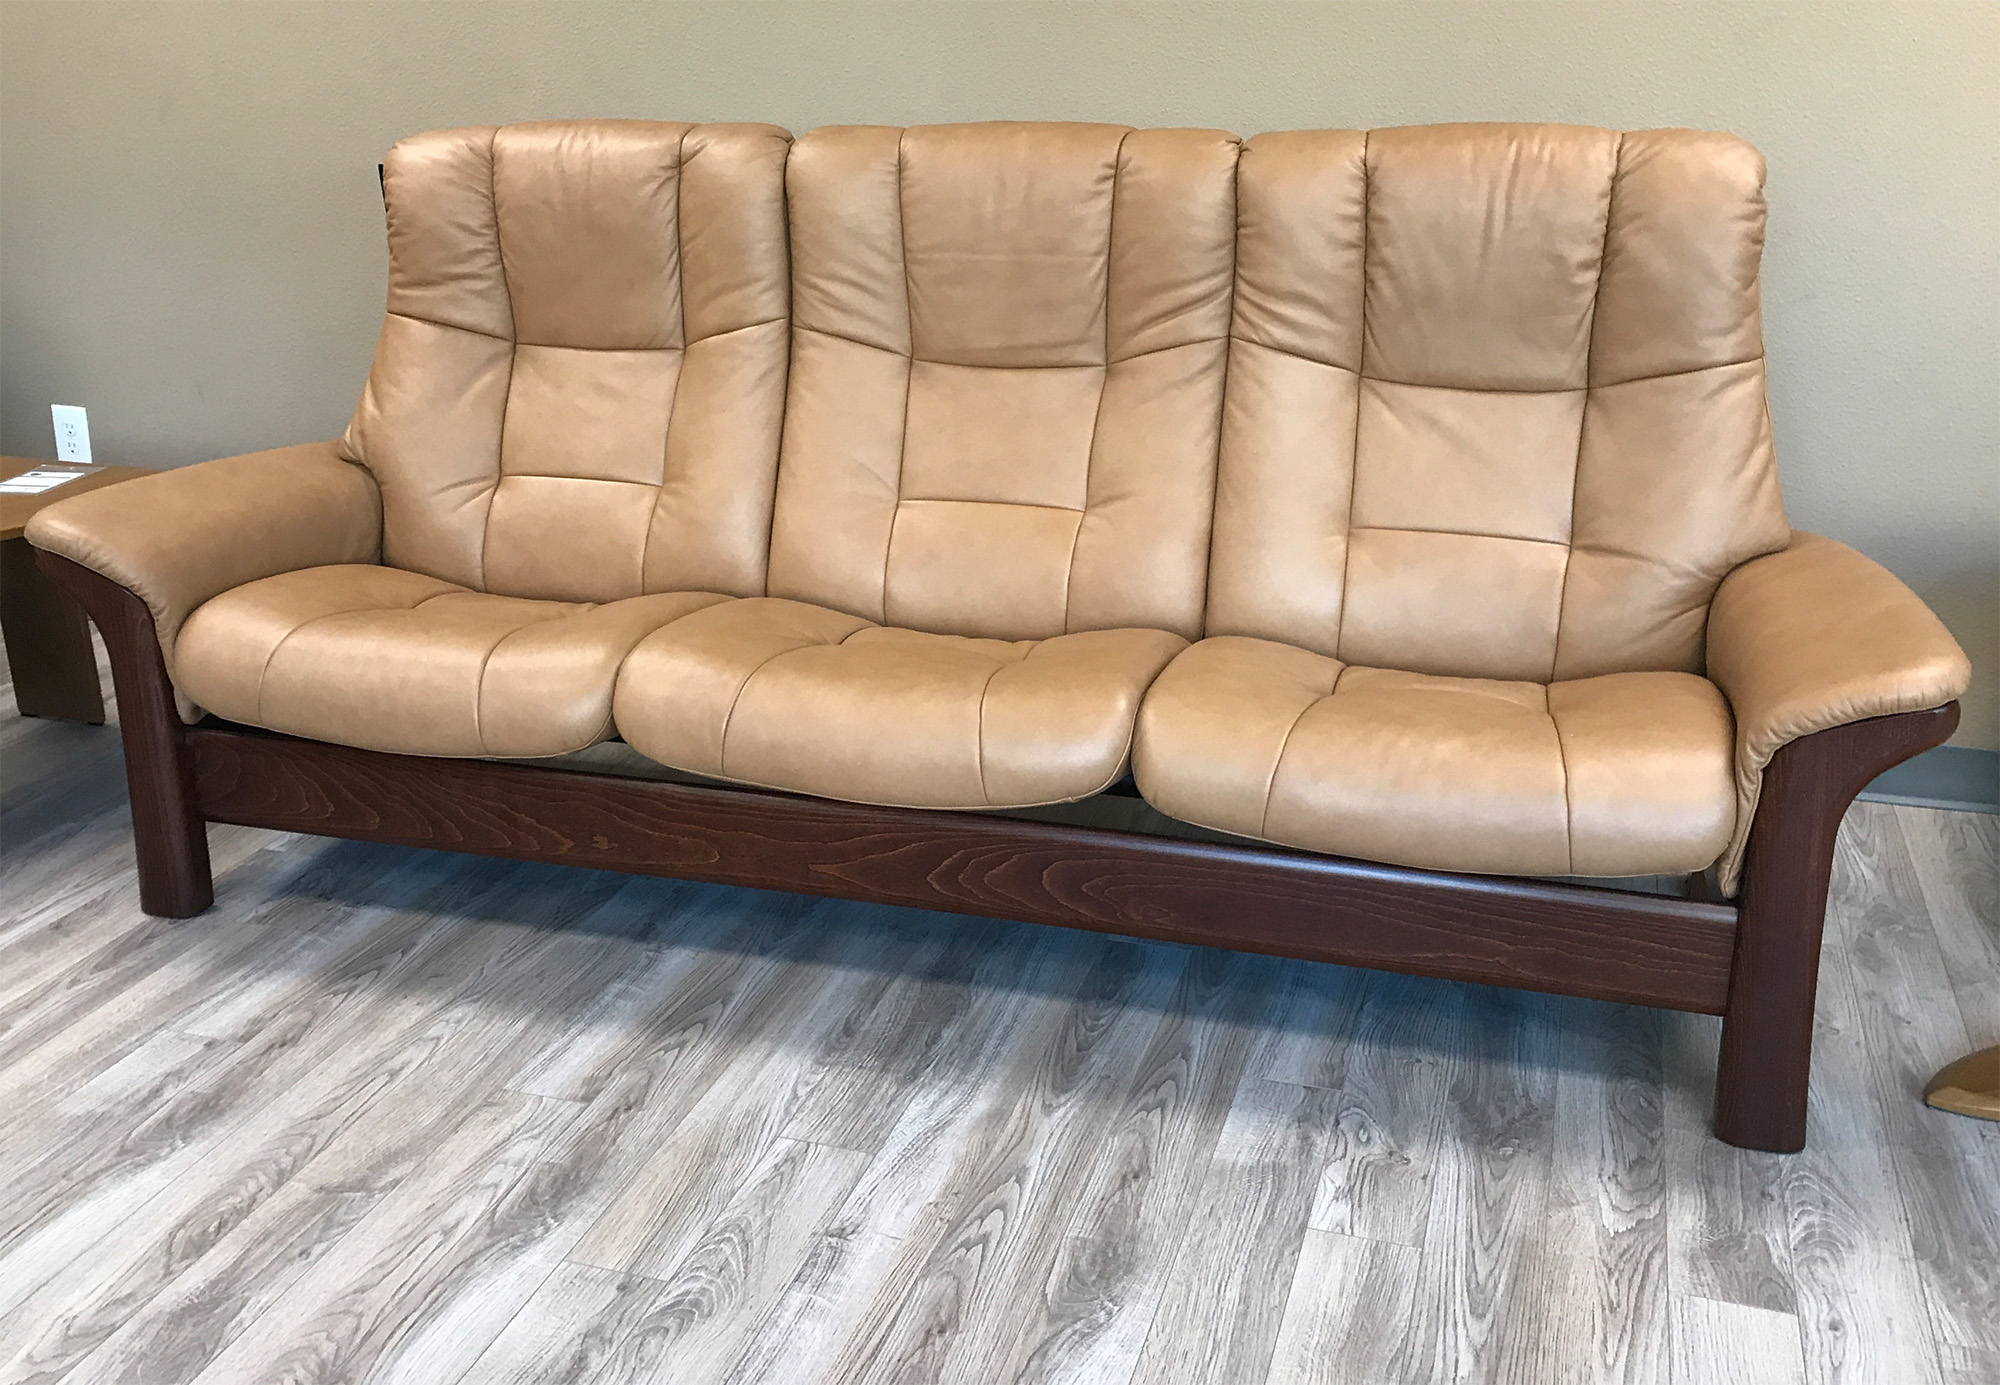 ekornes leather sofa stressless buckingham 3 seat high back sofa paloma taupe color